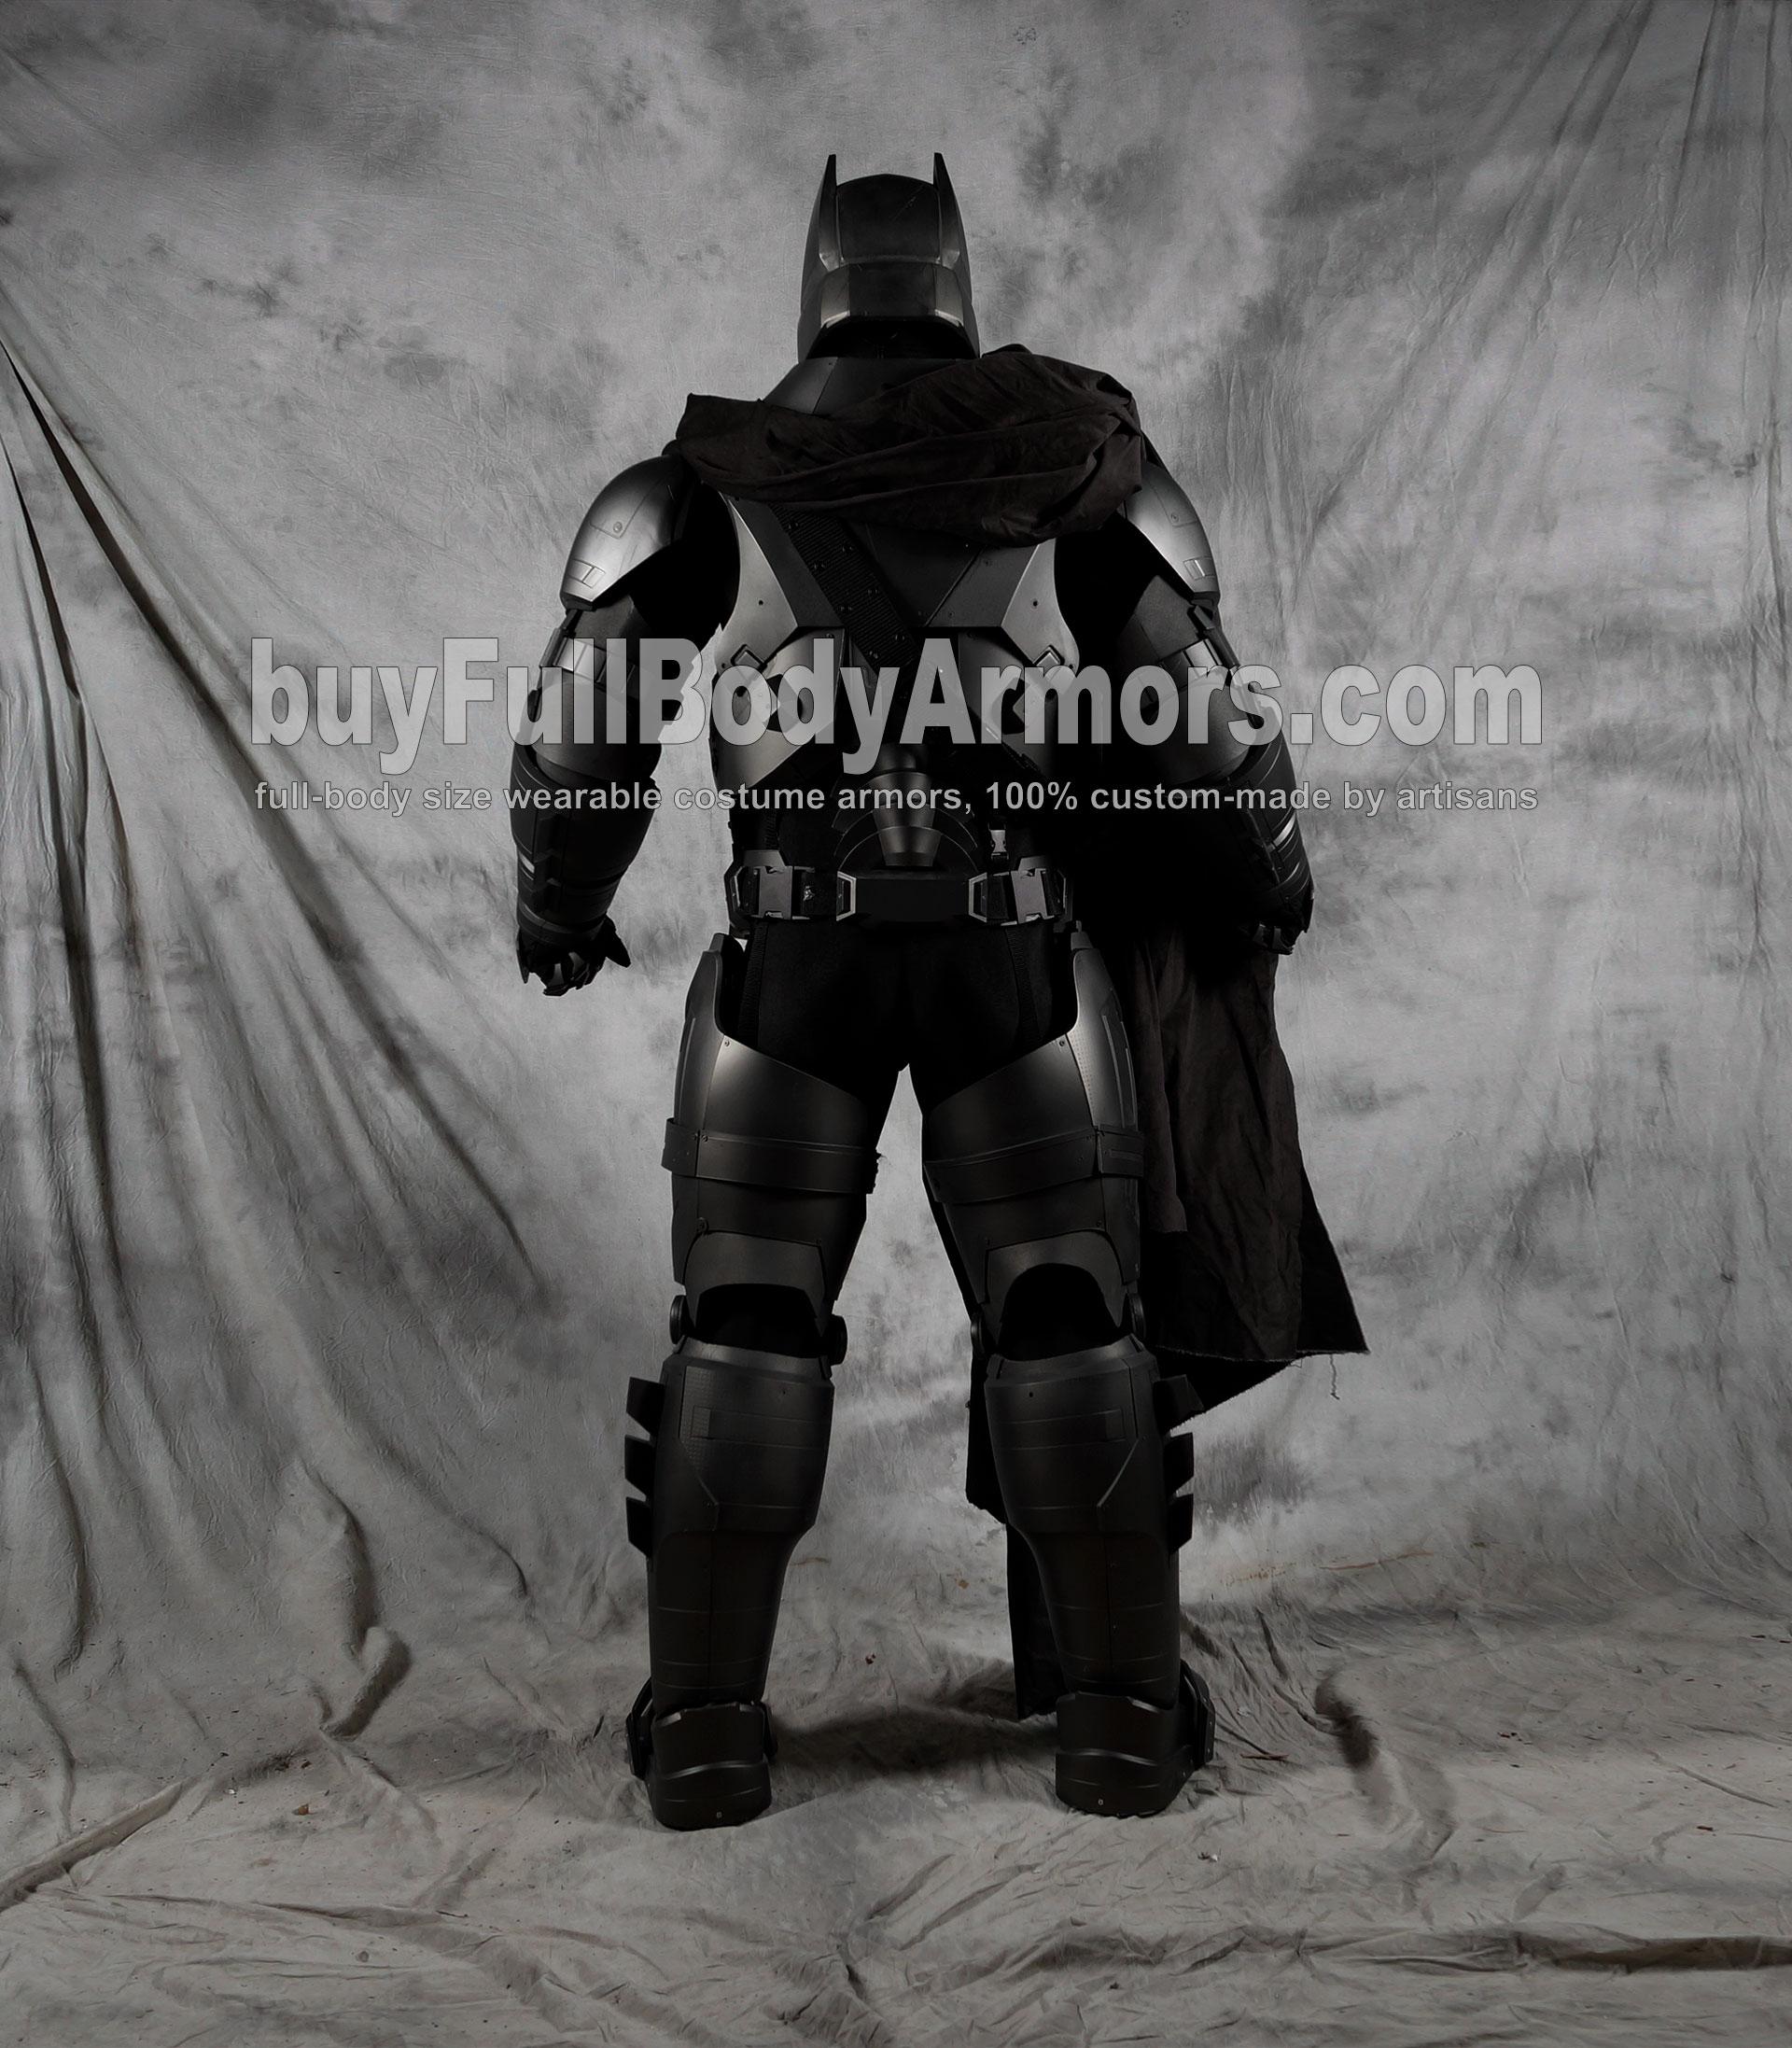 The Wearable Armored Batsuit (Batman armor suit costume) back clear